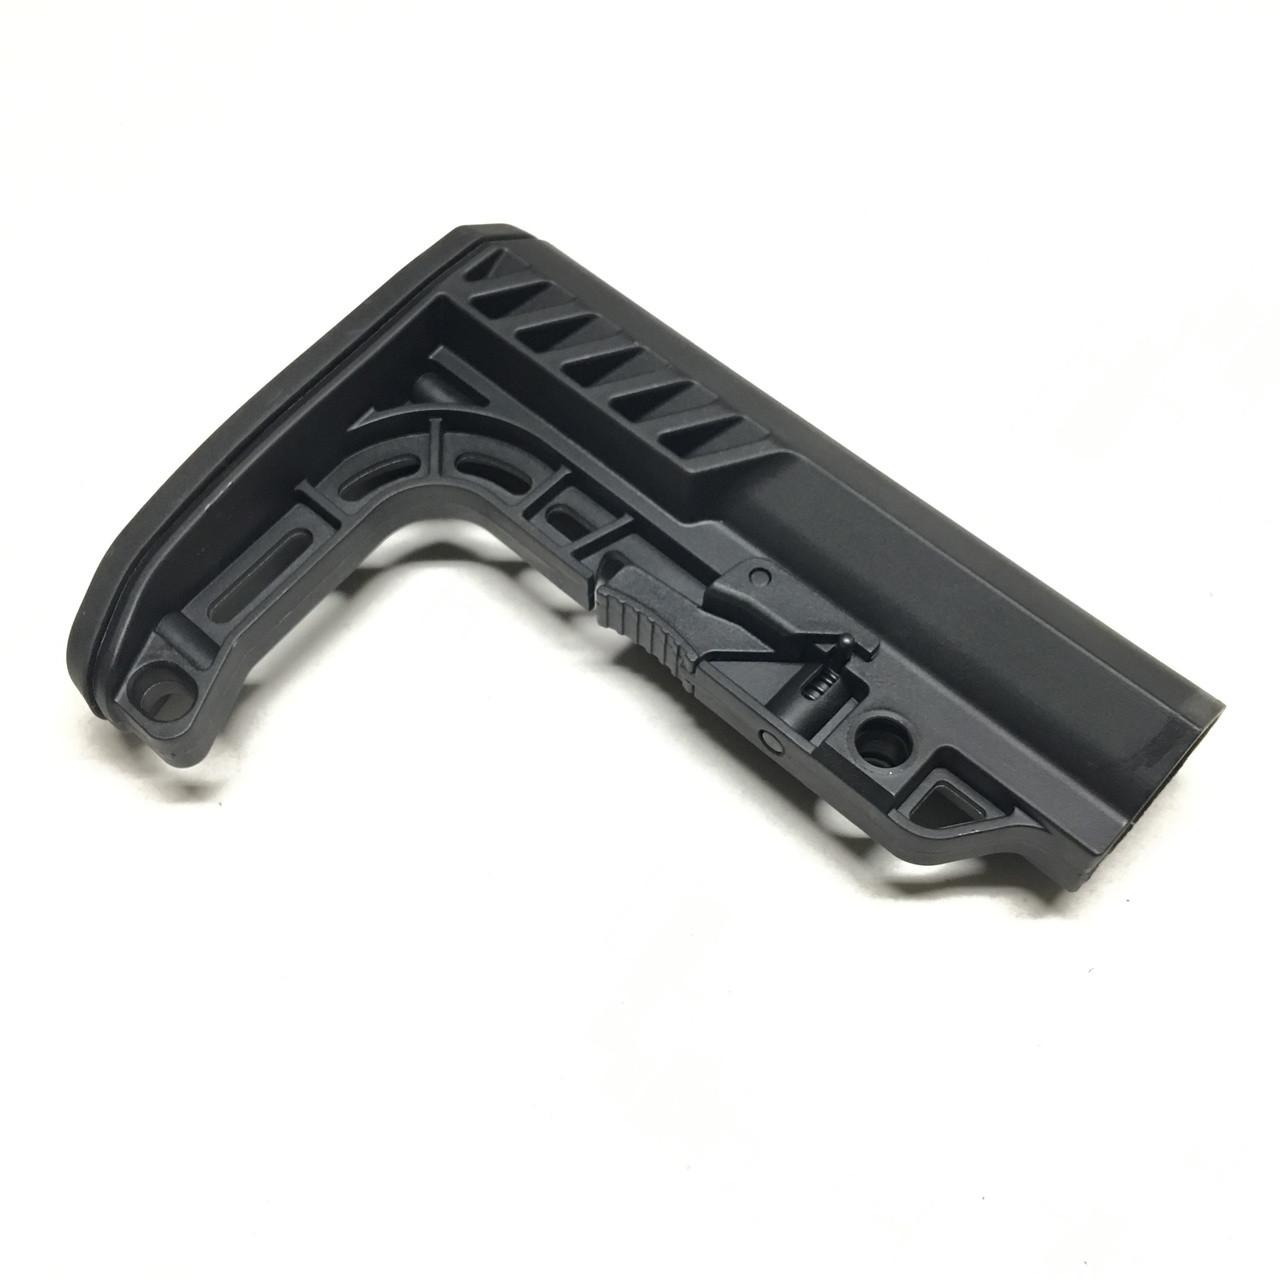 Tactic Minimalist Stock AR-15/M4